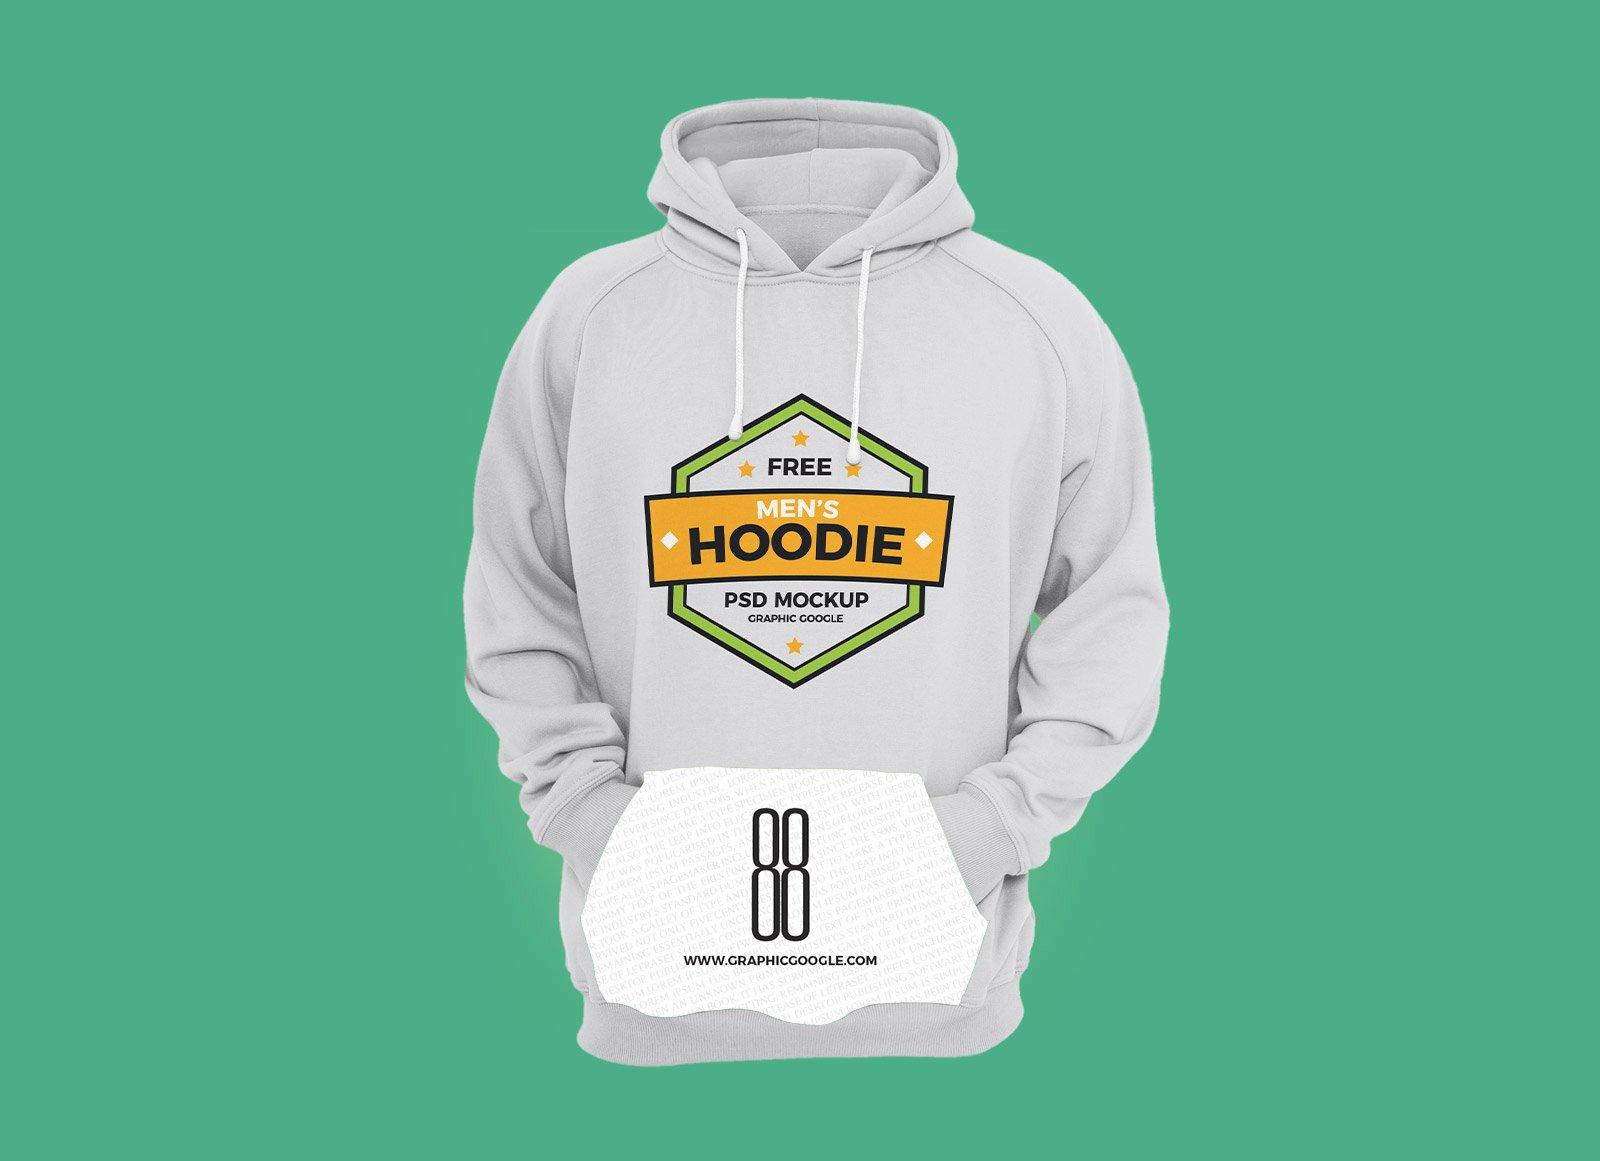 Free Hoodie Mockup Psd New Free Men S Hoo T Shirt Mockup Psd File Good Mockups